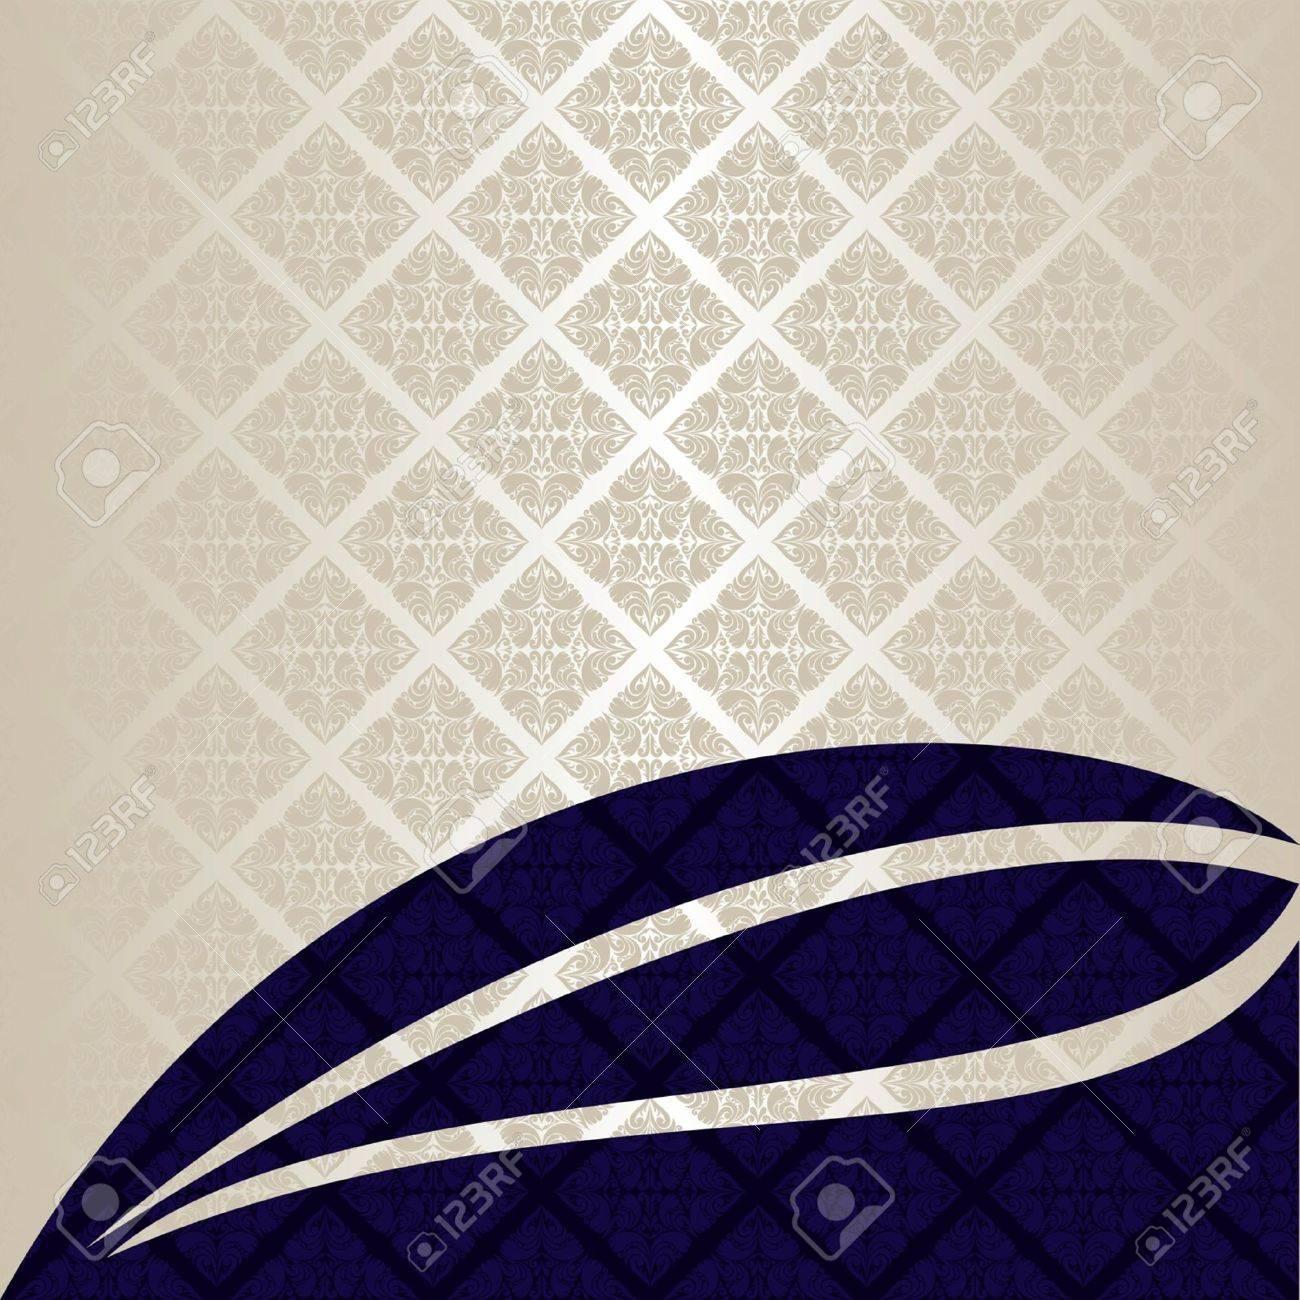 Luxury Background silver and dark blue EPS 10 - 14420532